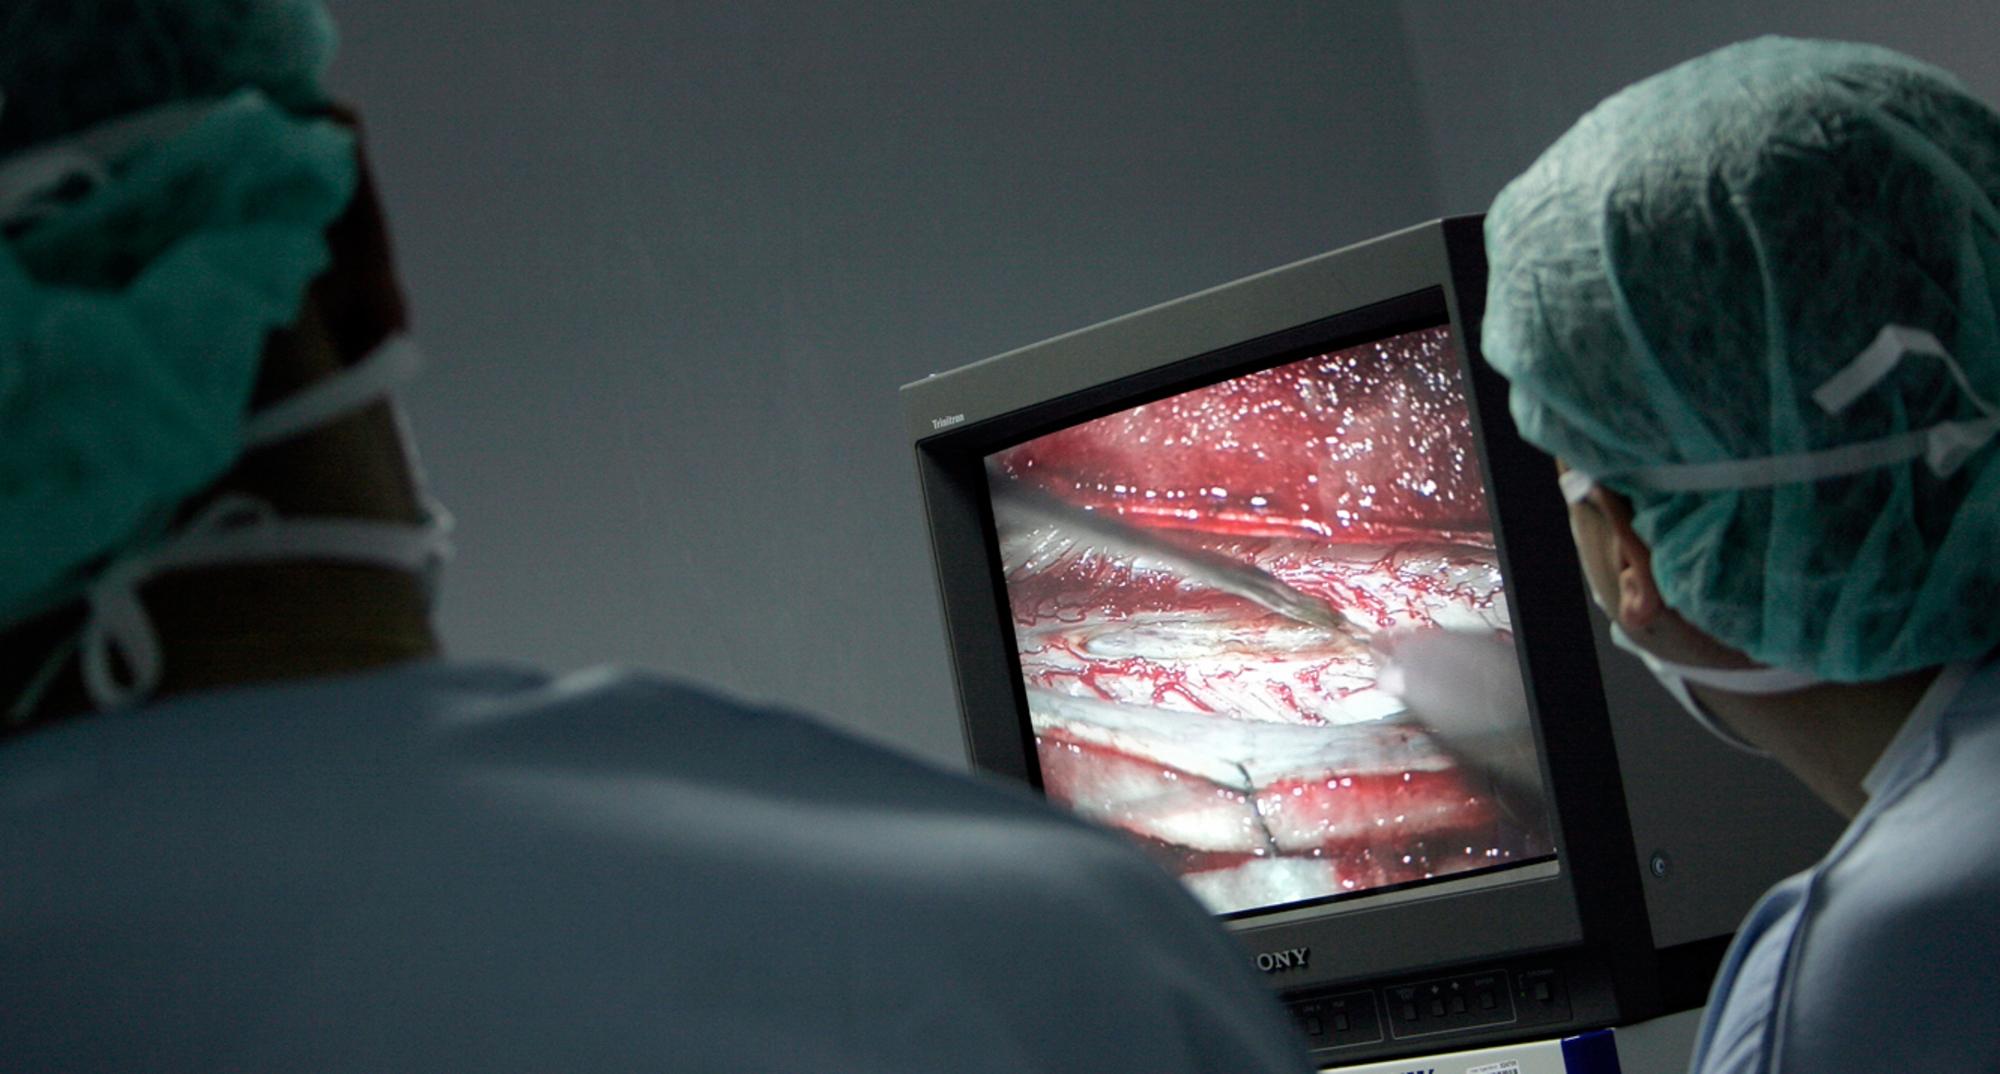 Essay on neurosurgery - Coursework Example